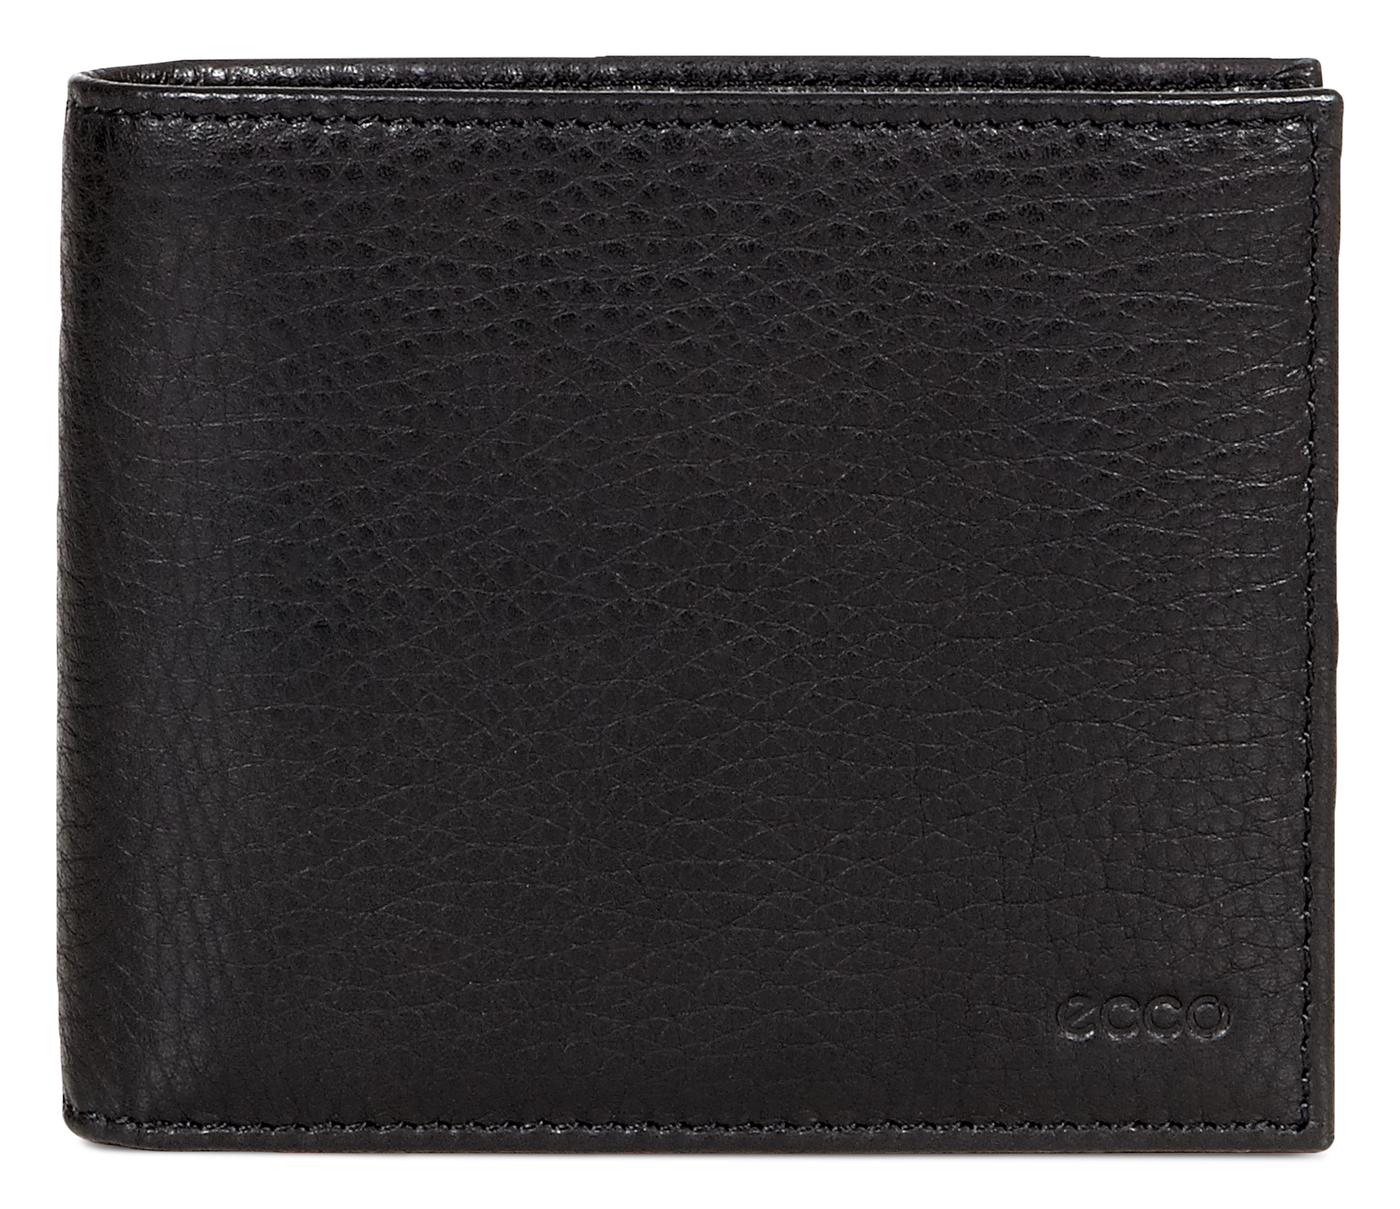 ECCO Gordon Flap Wallet